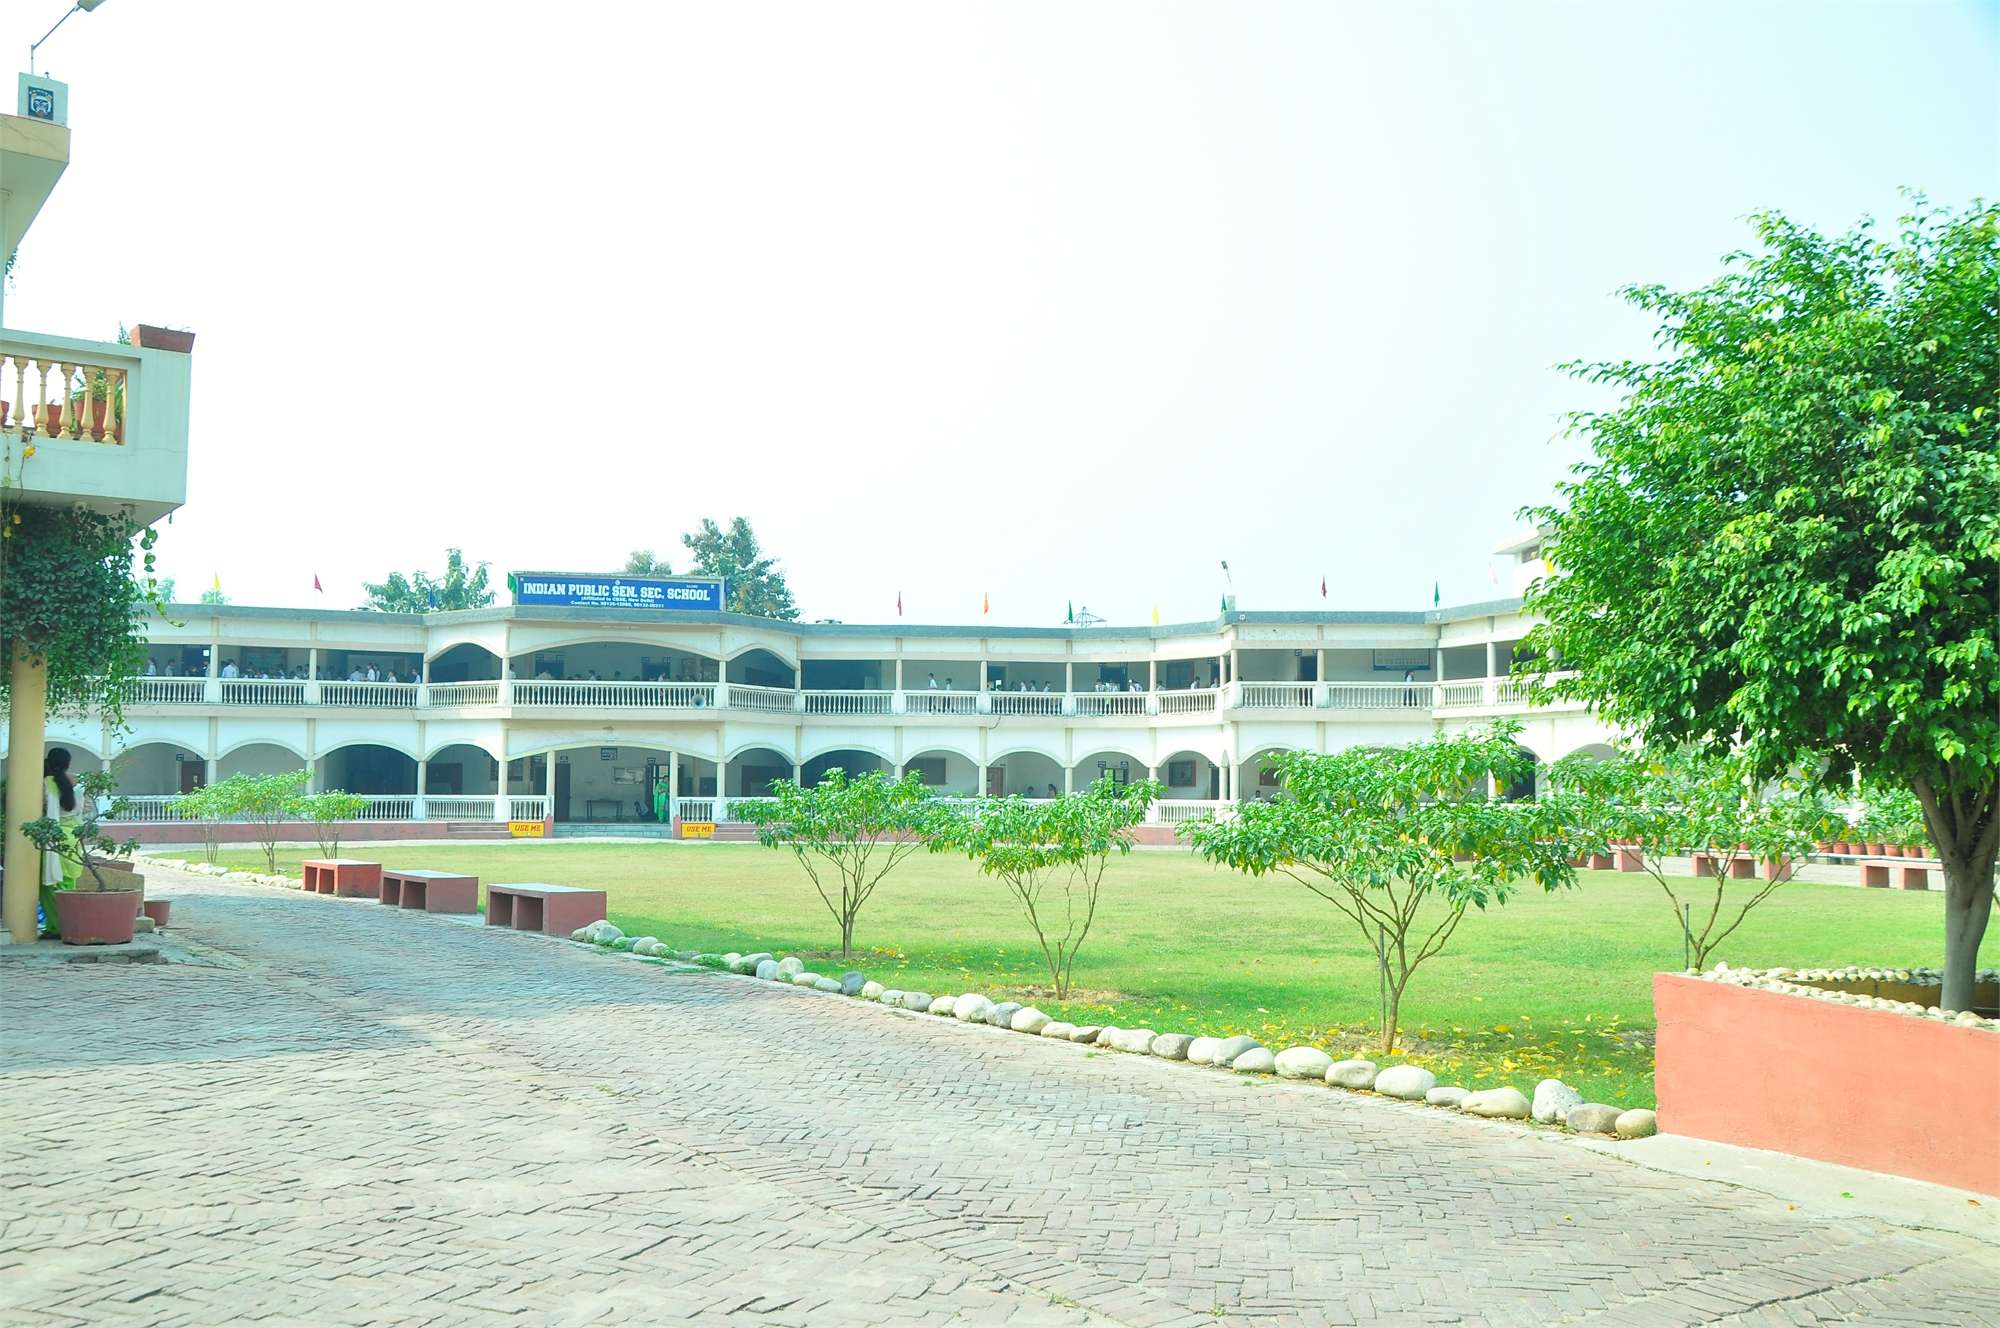 INDIAN PUBLIC SCHOOL VILL GHESPUR PO RADAUR DISTT YAMUNA NAGAR HARYANA 530466